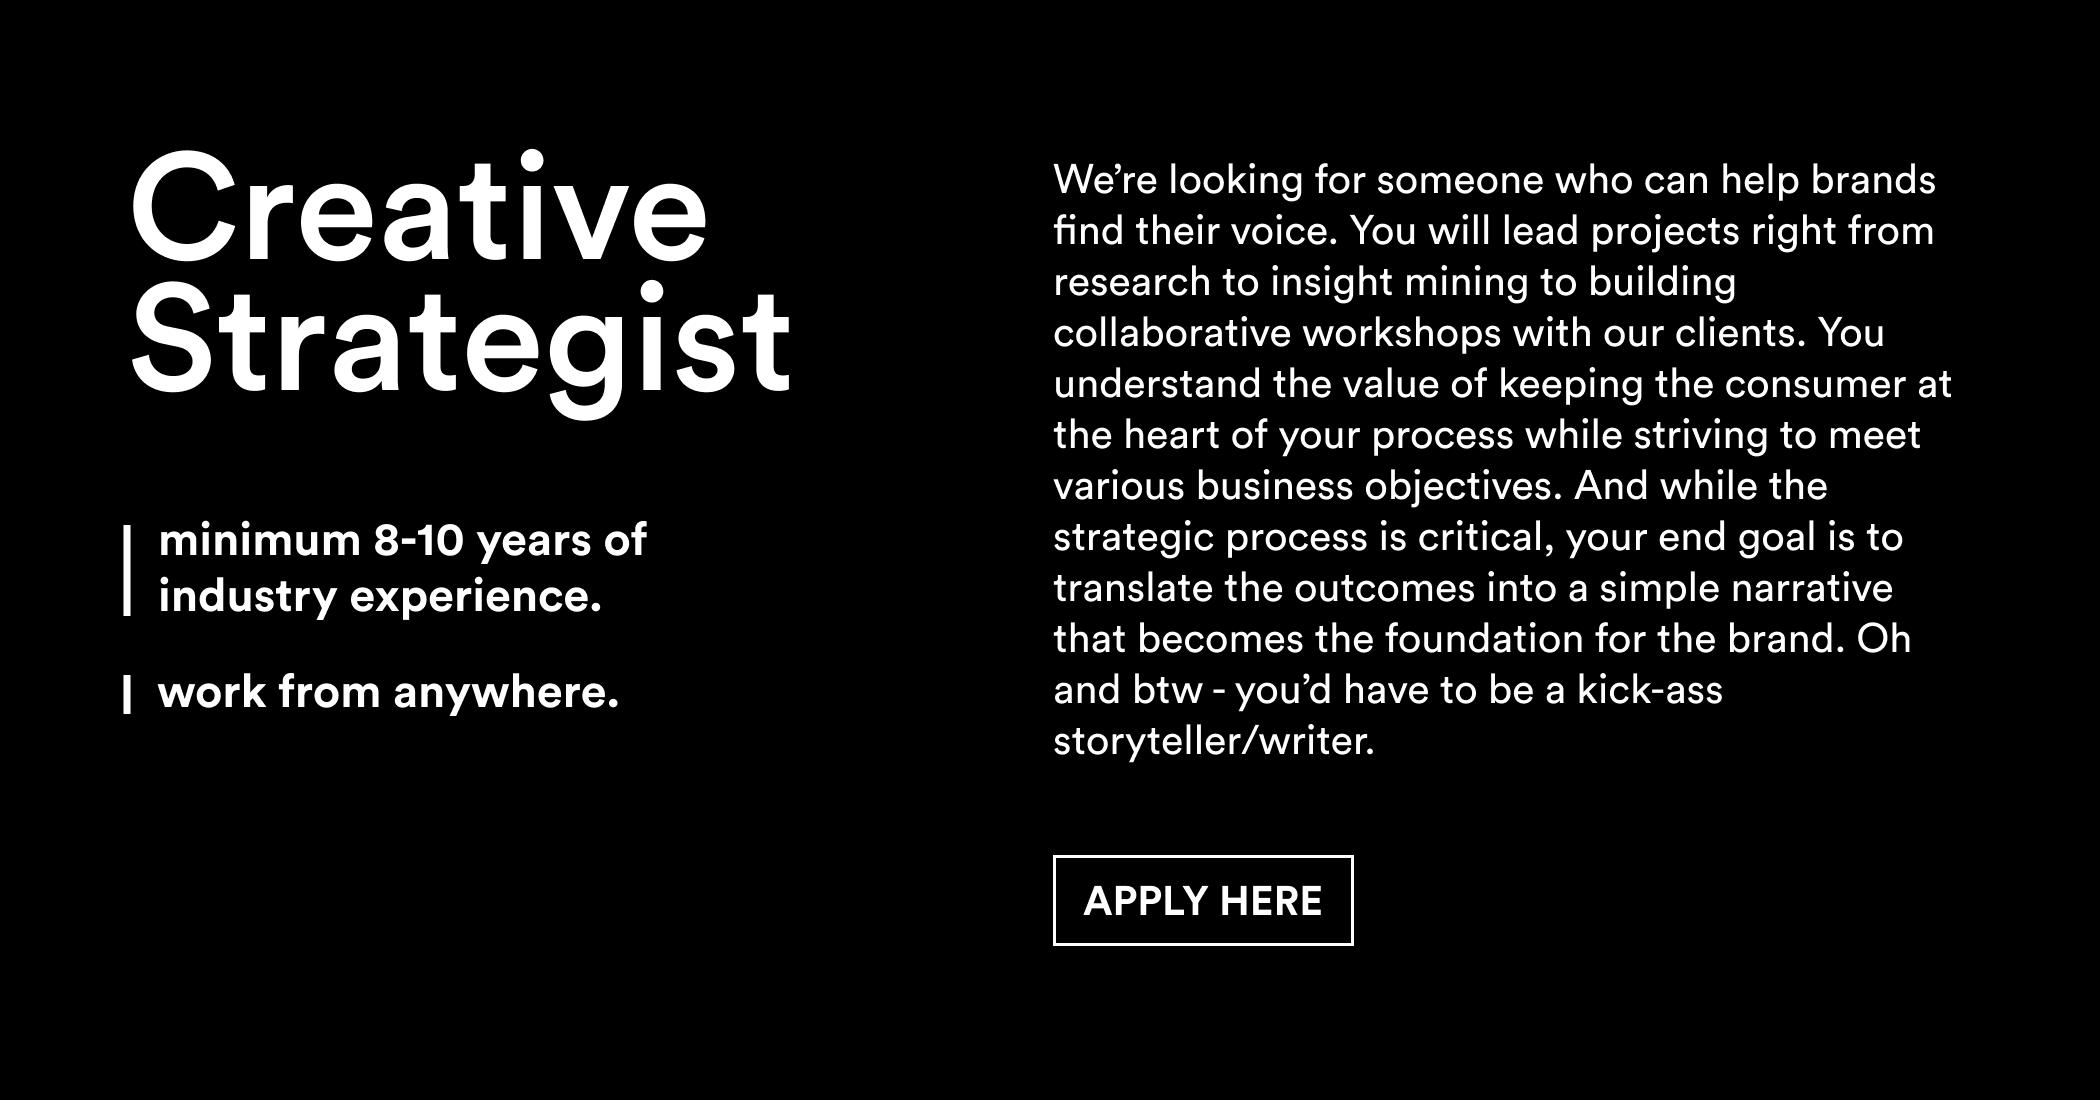 Linkedin – Creative Strategist